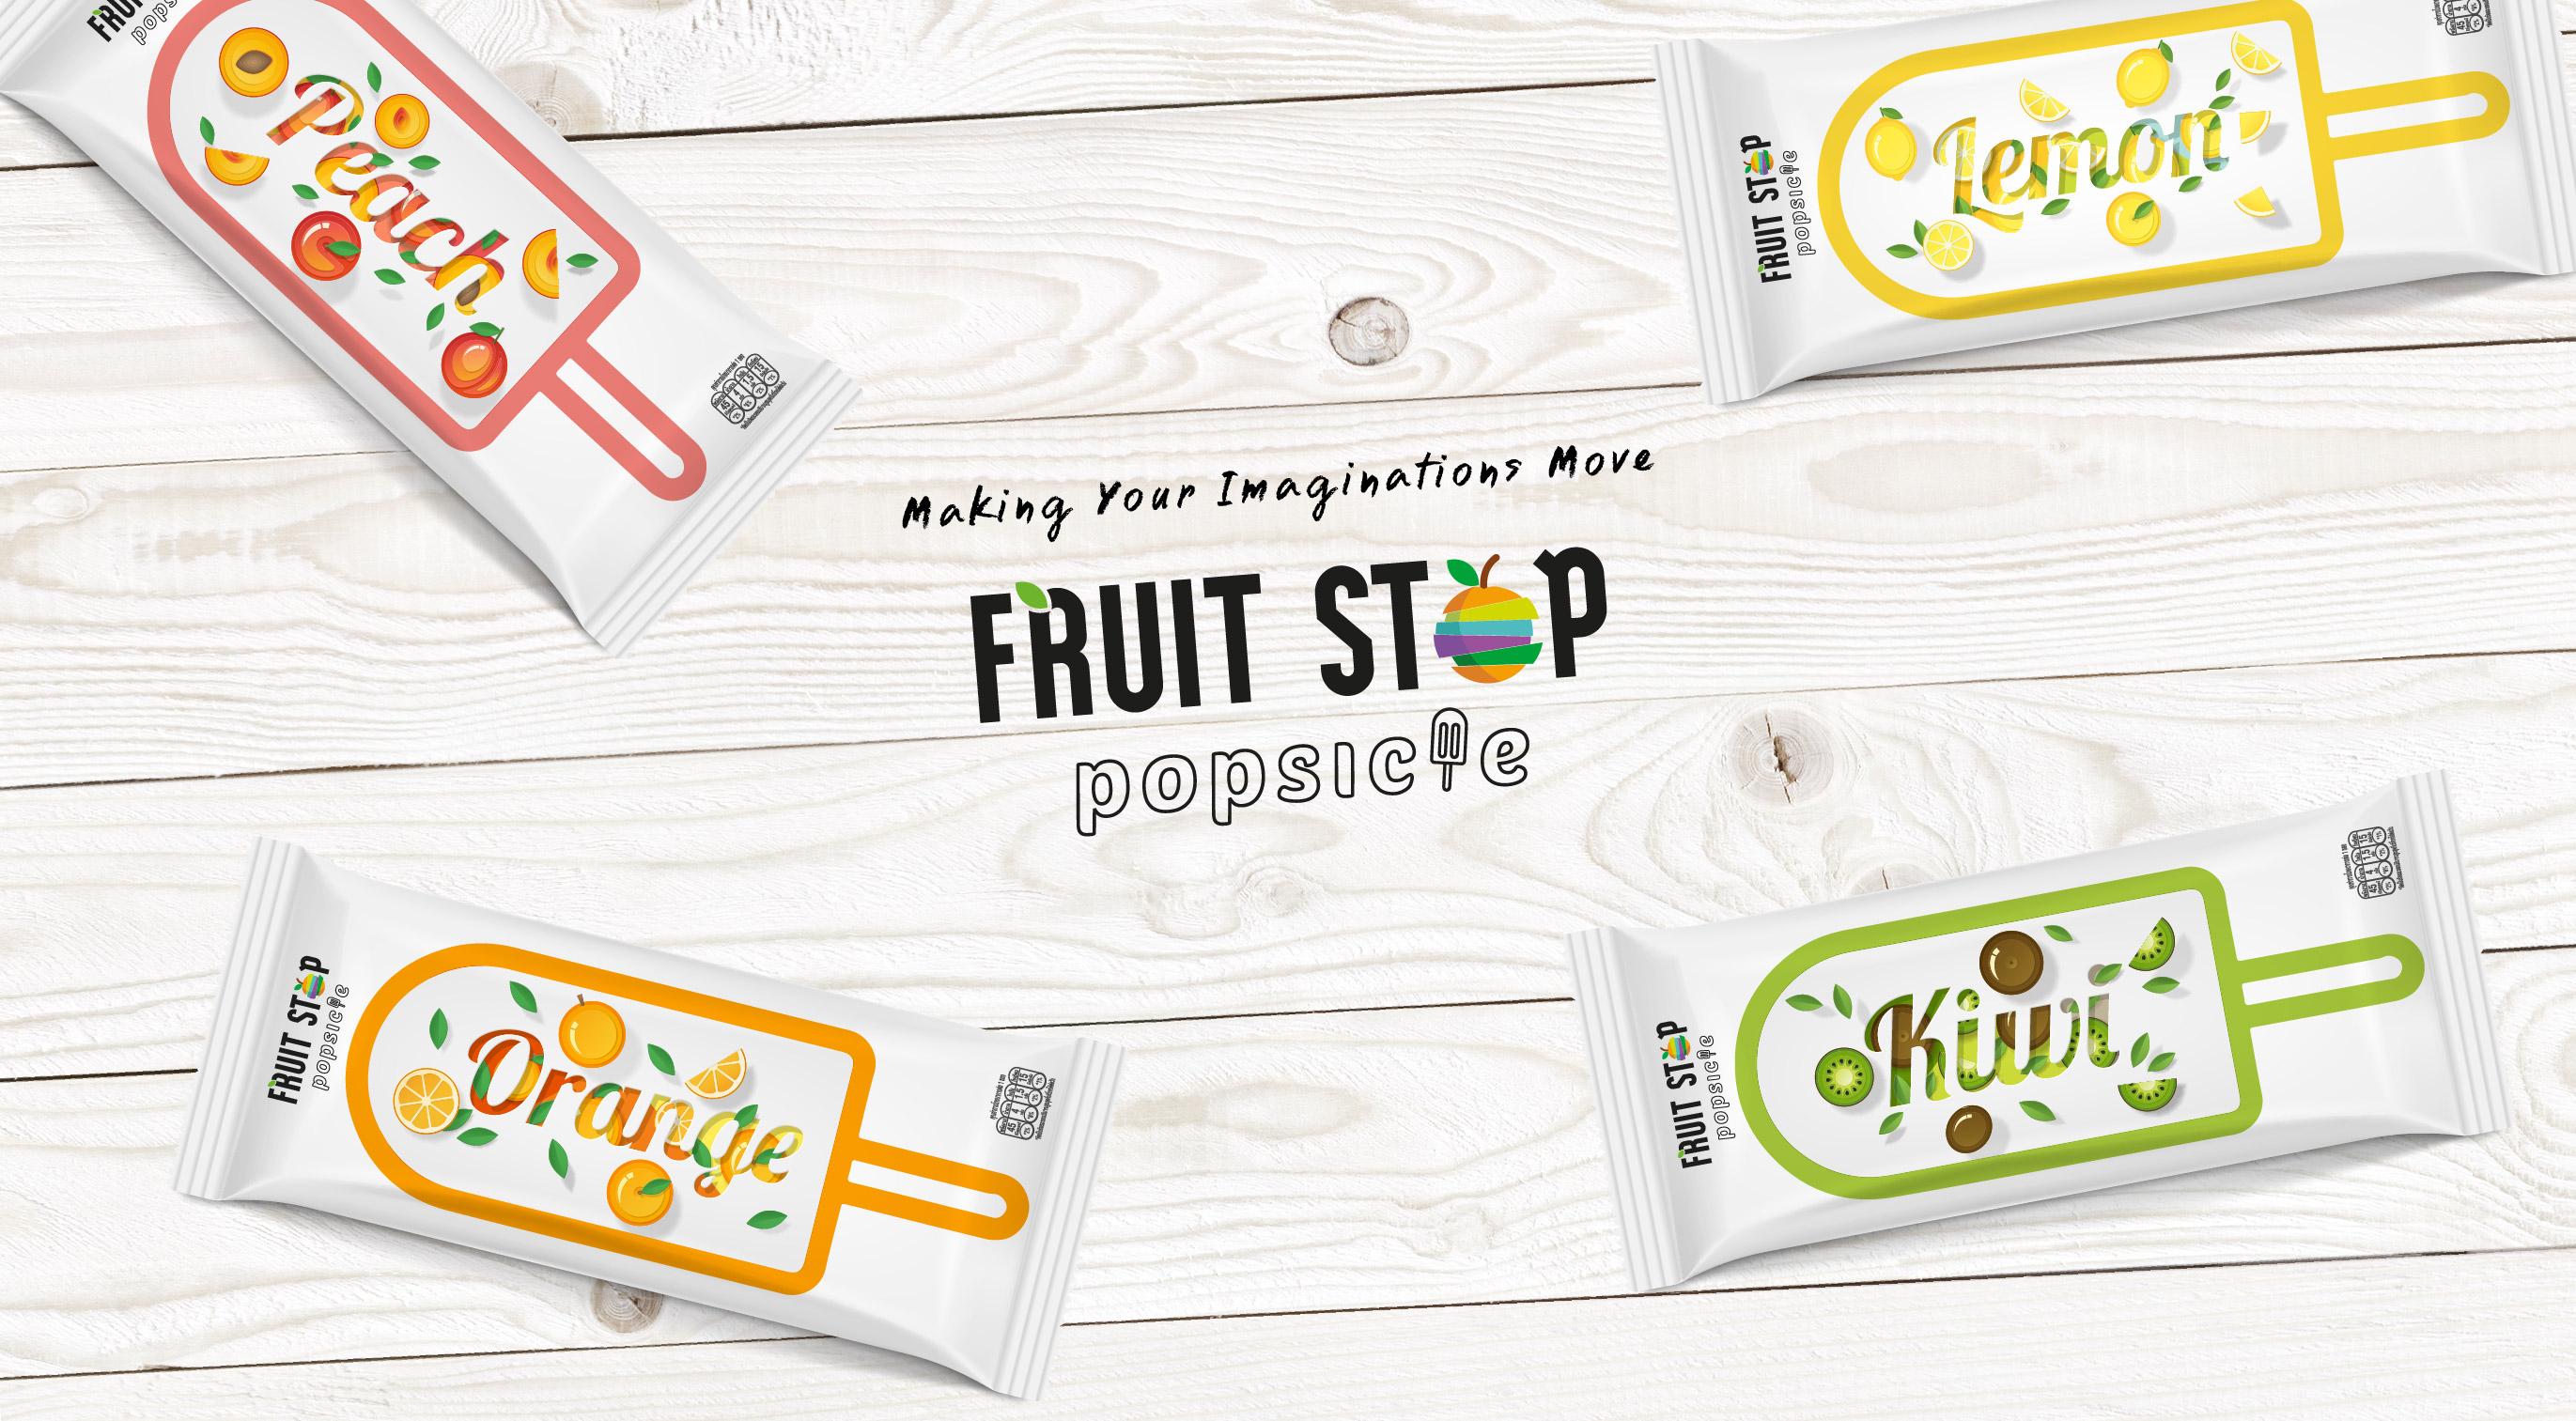 FruitStop Popsicle Packaging